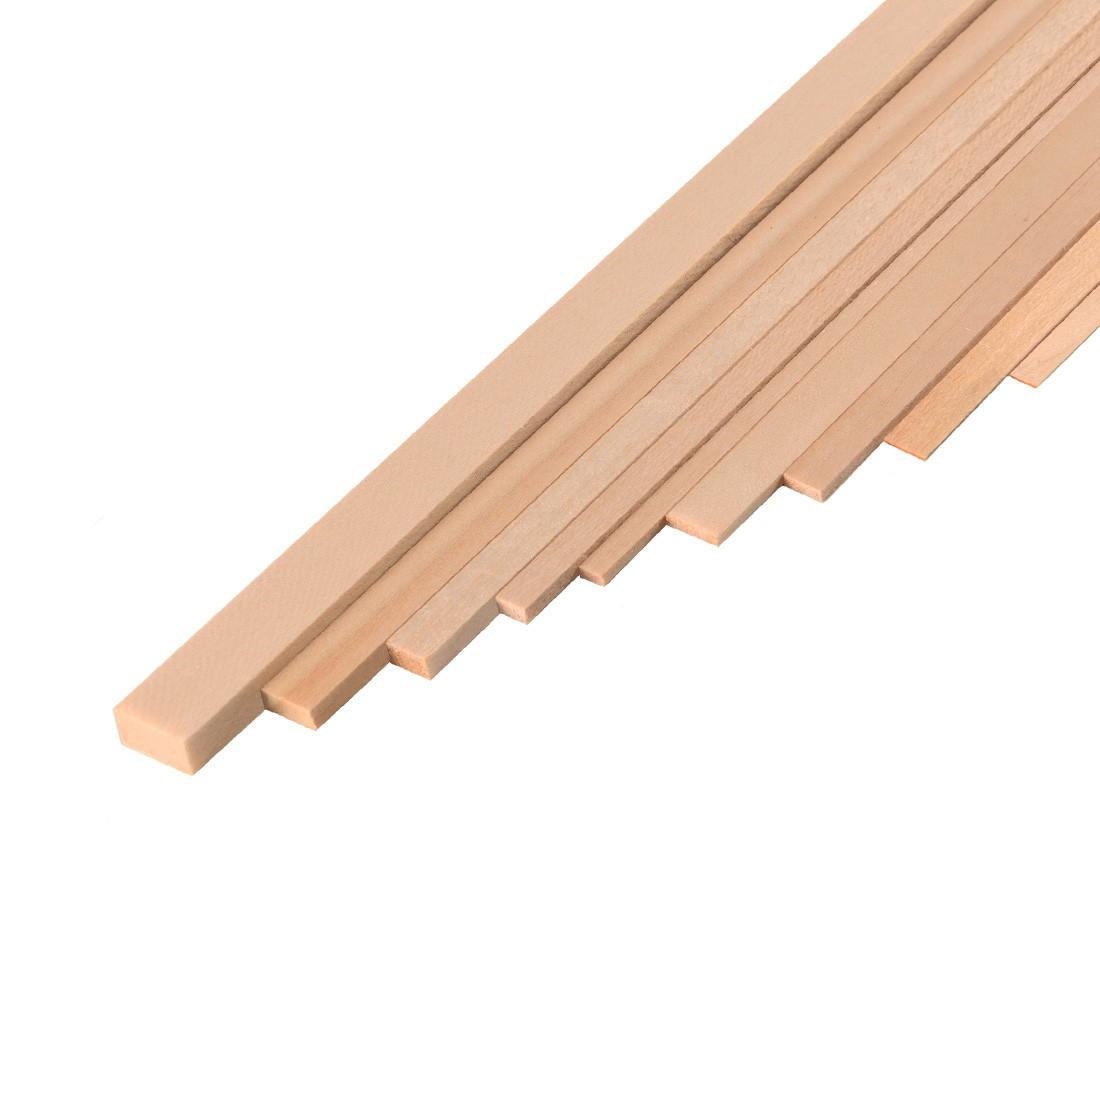 Limewood strip 0,5x5